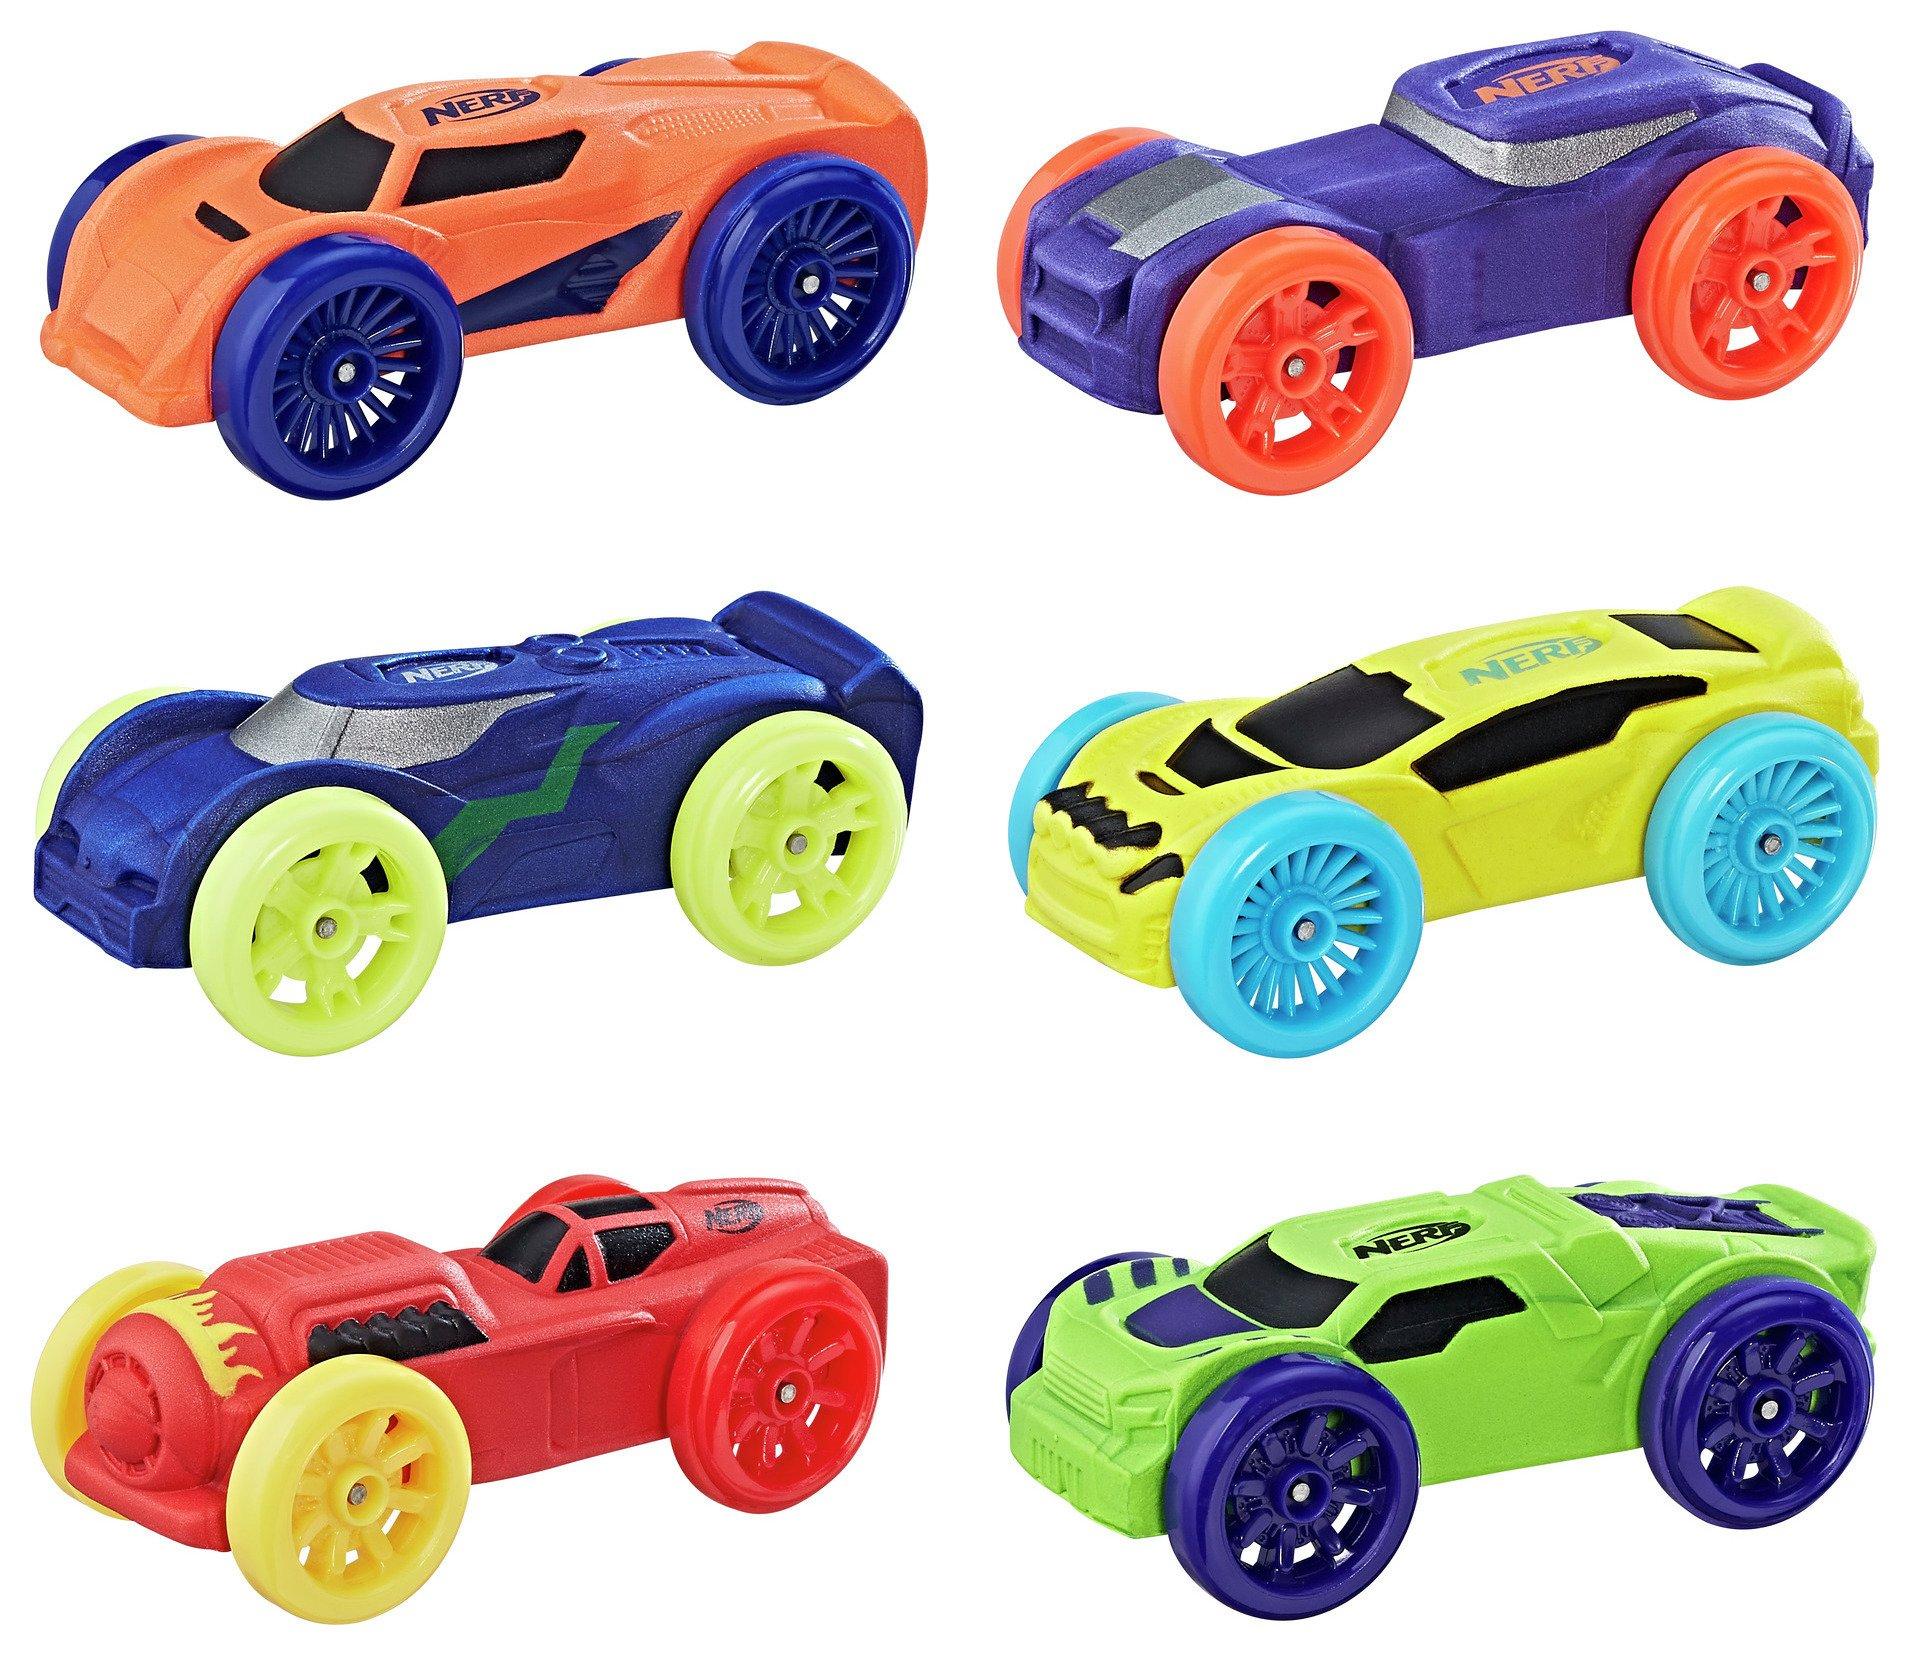 Nerf Nitro Foam Car 6-Pack Assortment